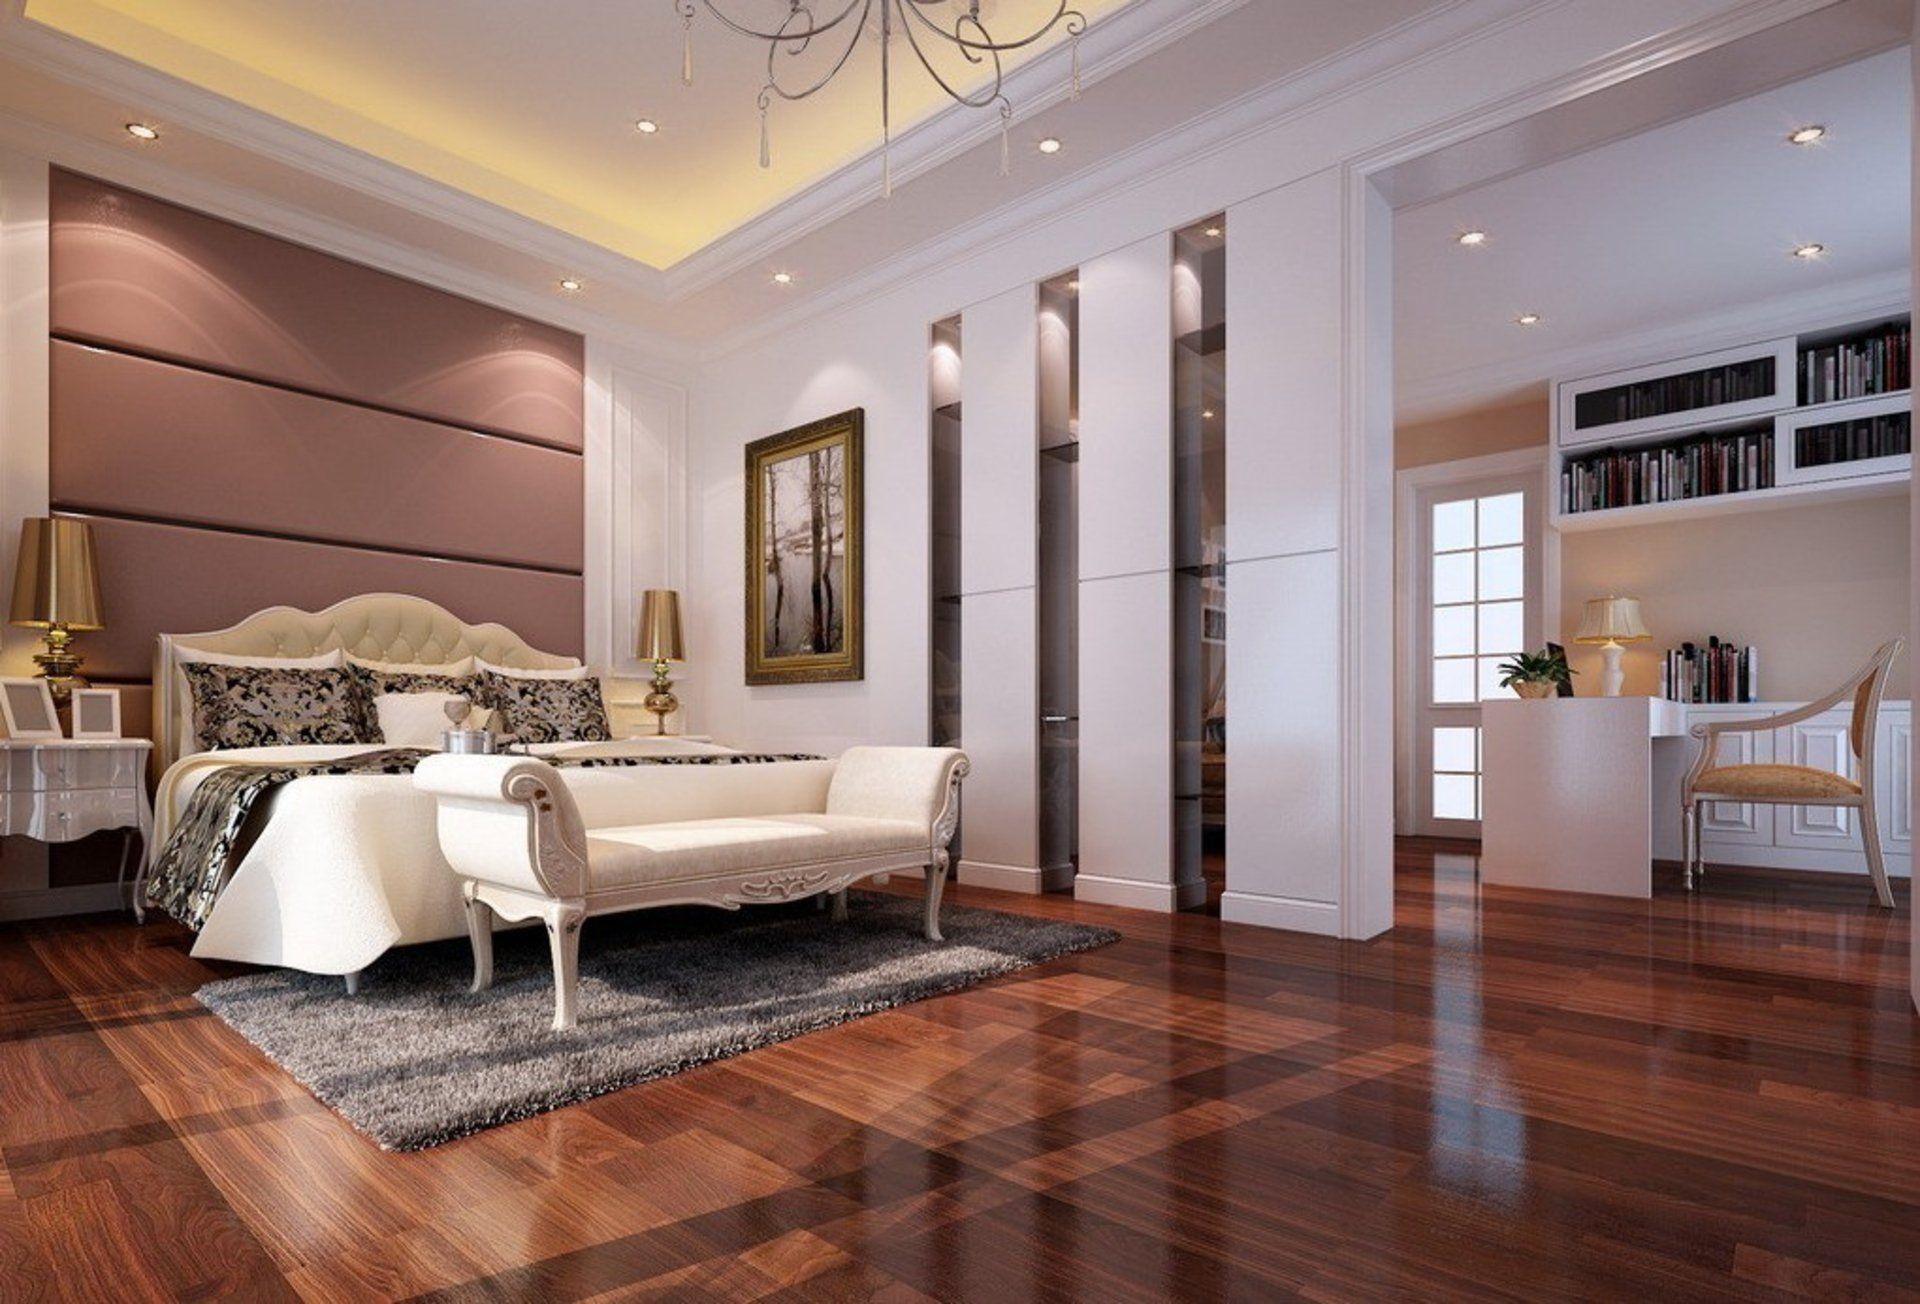 Designing Bedrooms Bedroom  Laminated Wood Flooring For Luxury Bedroom Design